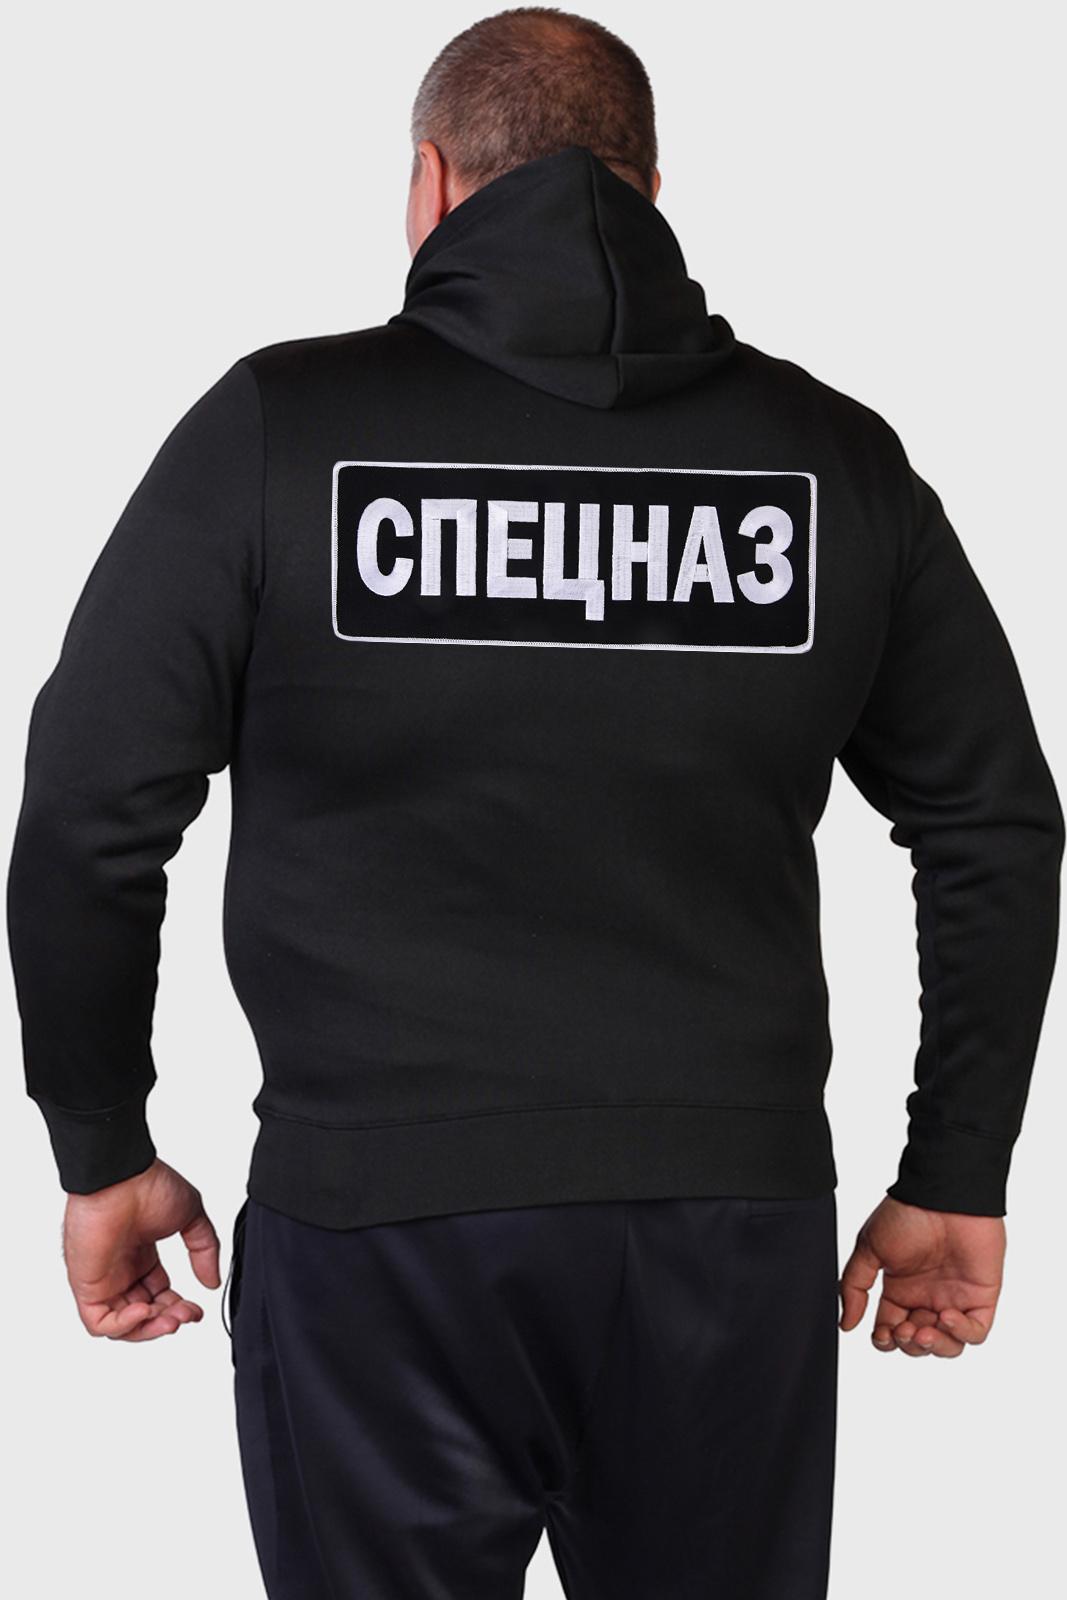 Мужская черная толстовка СПЕЦНАЗ.